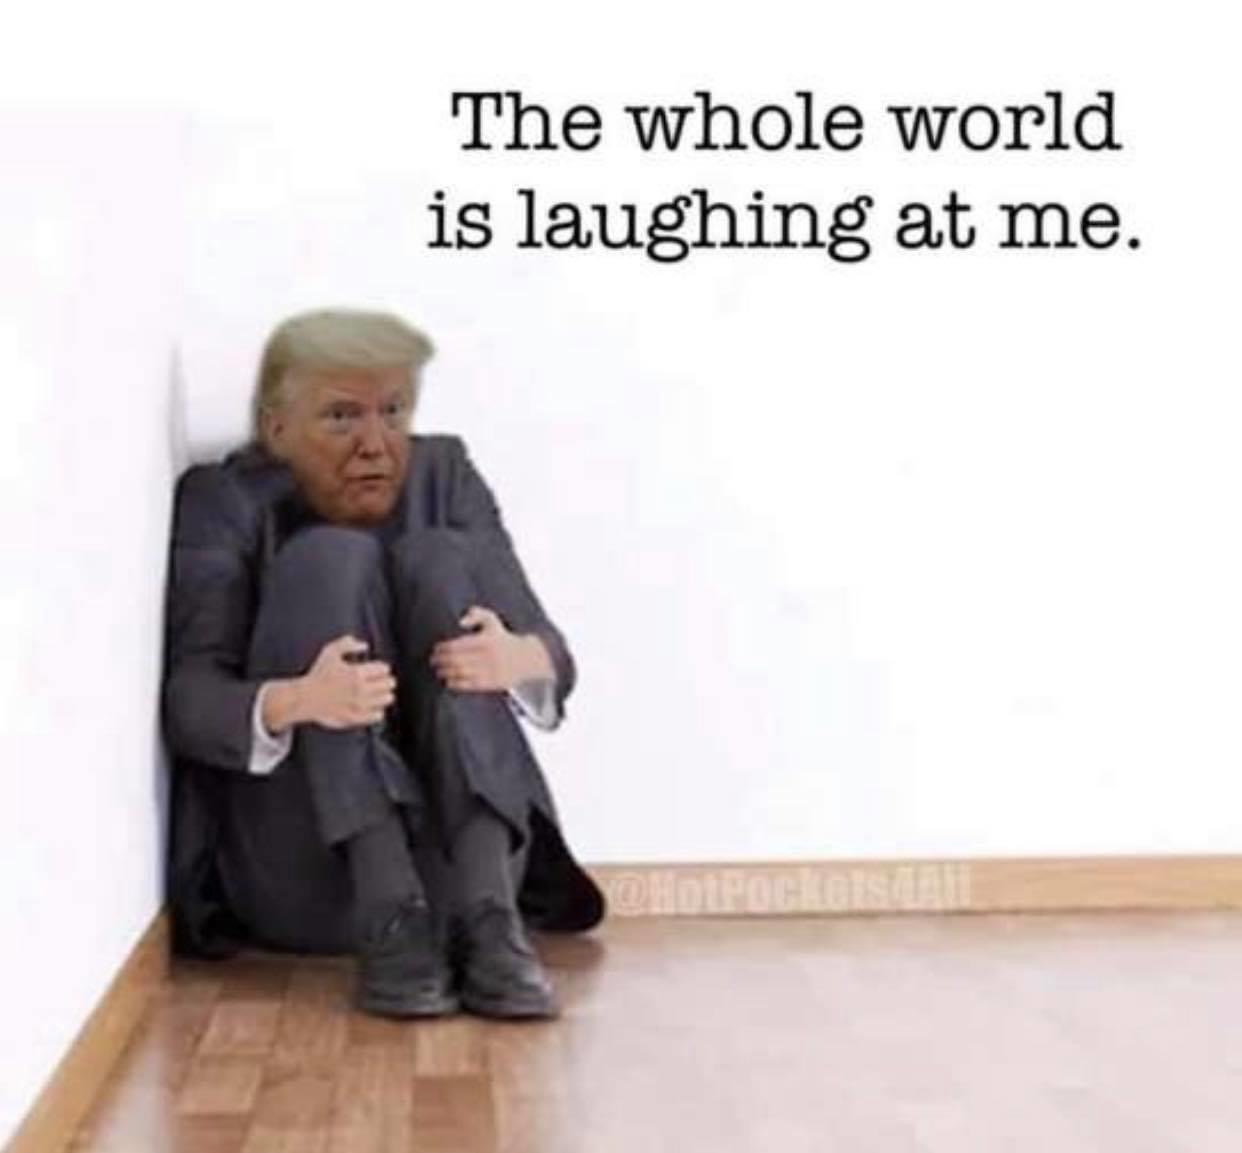 trump-whole-world-laughing.jpg.96fcea0aedcf2db3b282832f20b36cbb.jpg